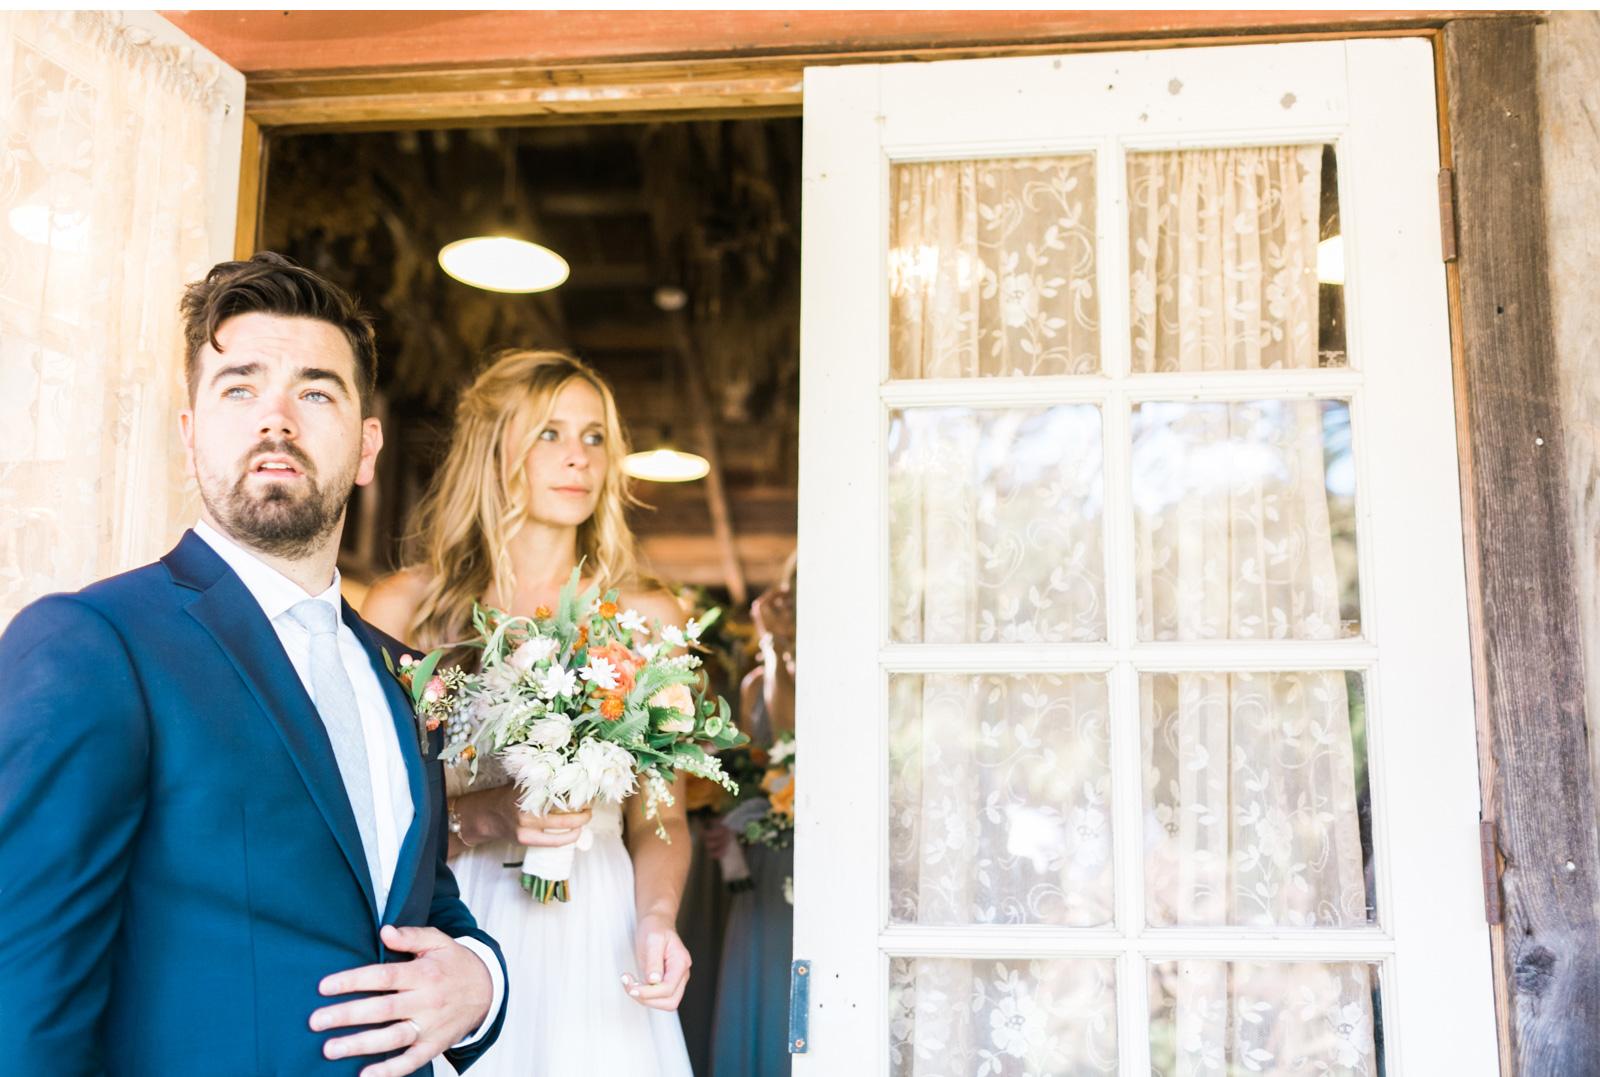 Avila-Beach-Wedding-Style-Me-Pretty-Natalie-Schutt-Photography_14.jpg